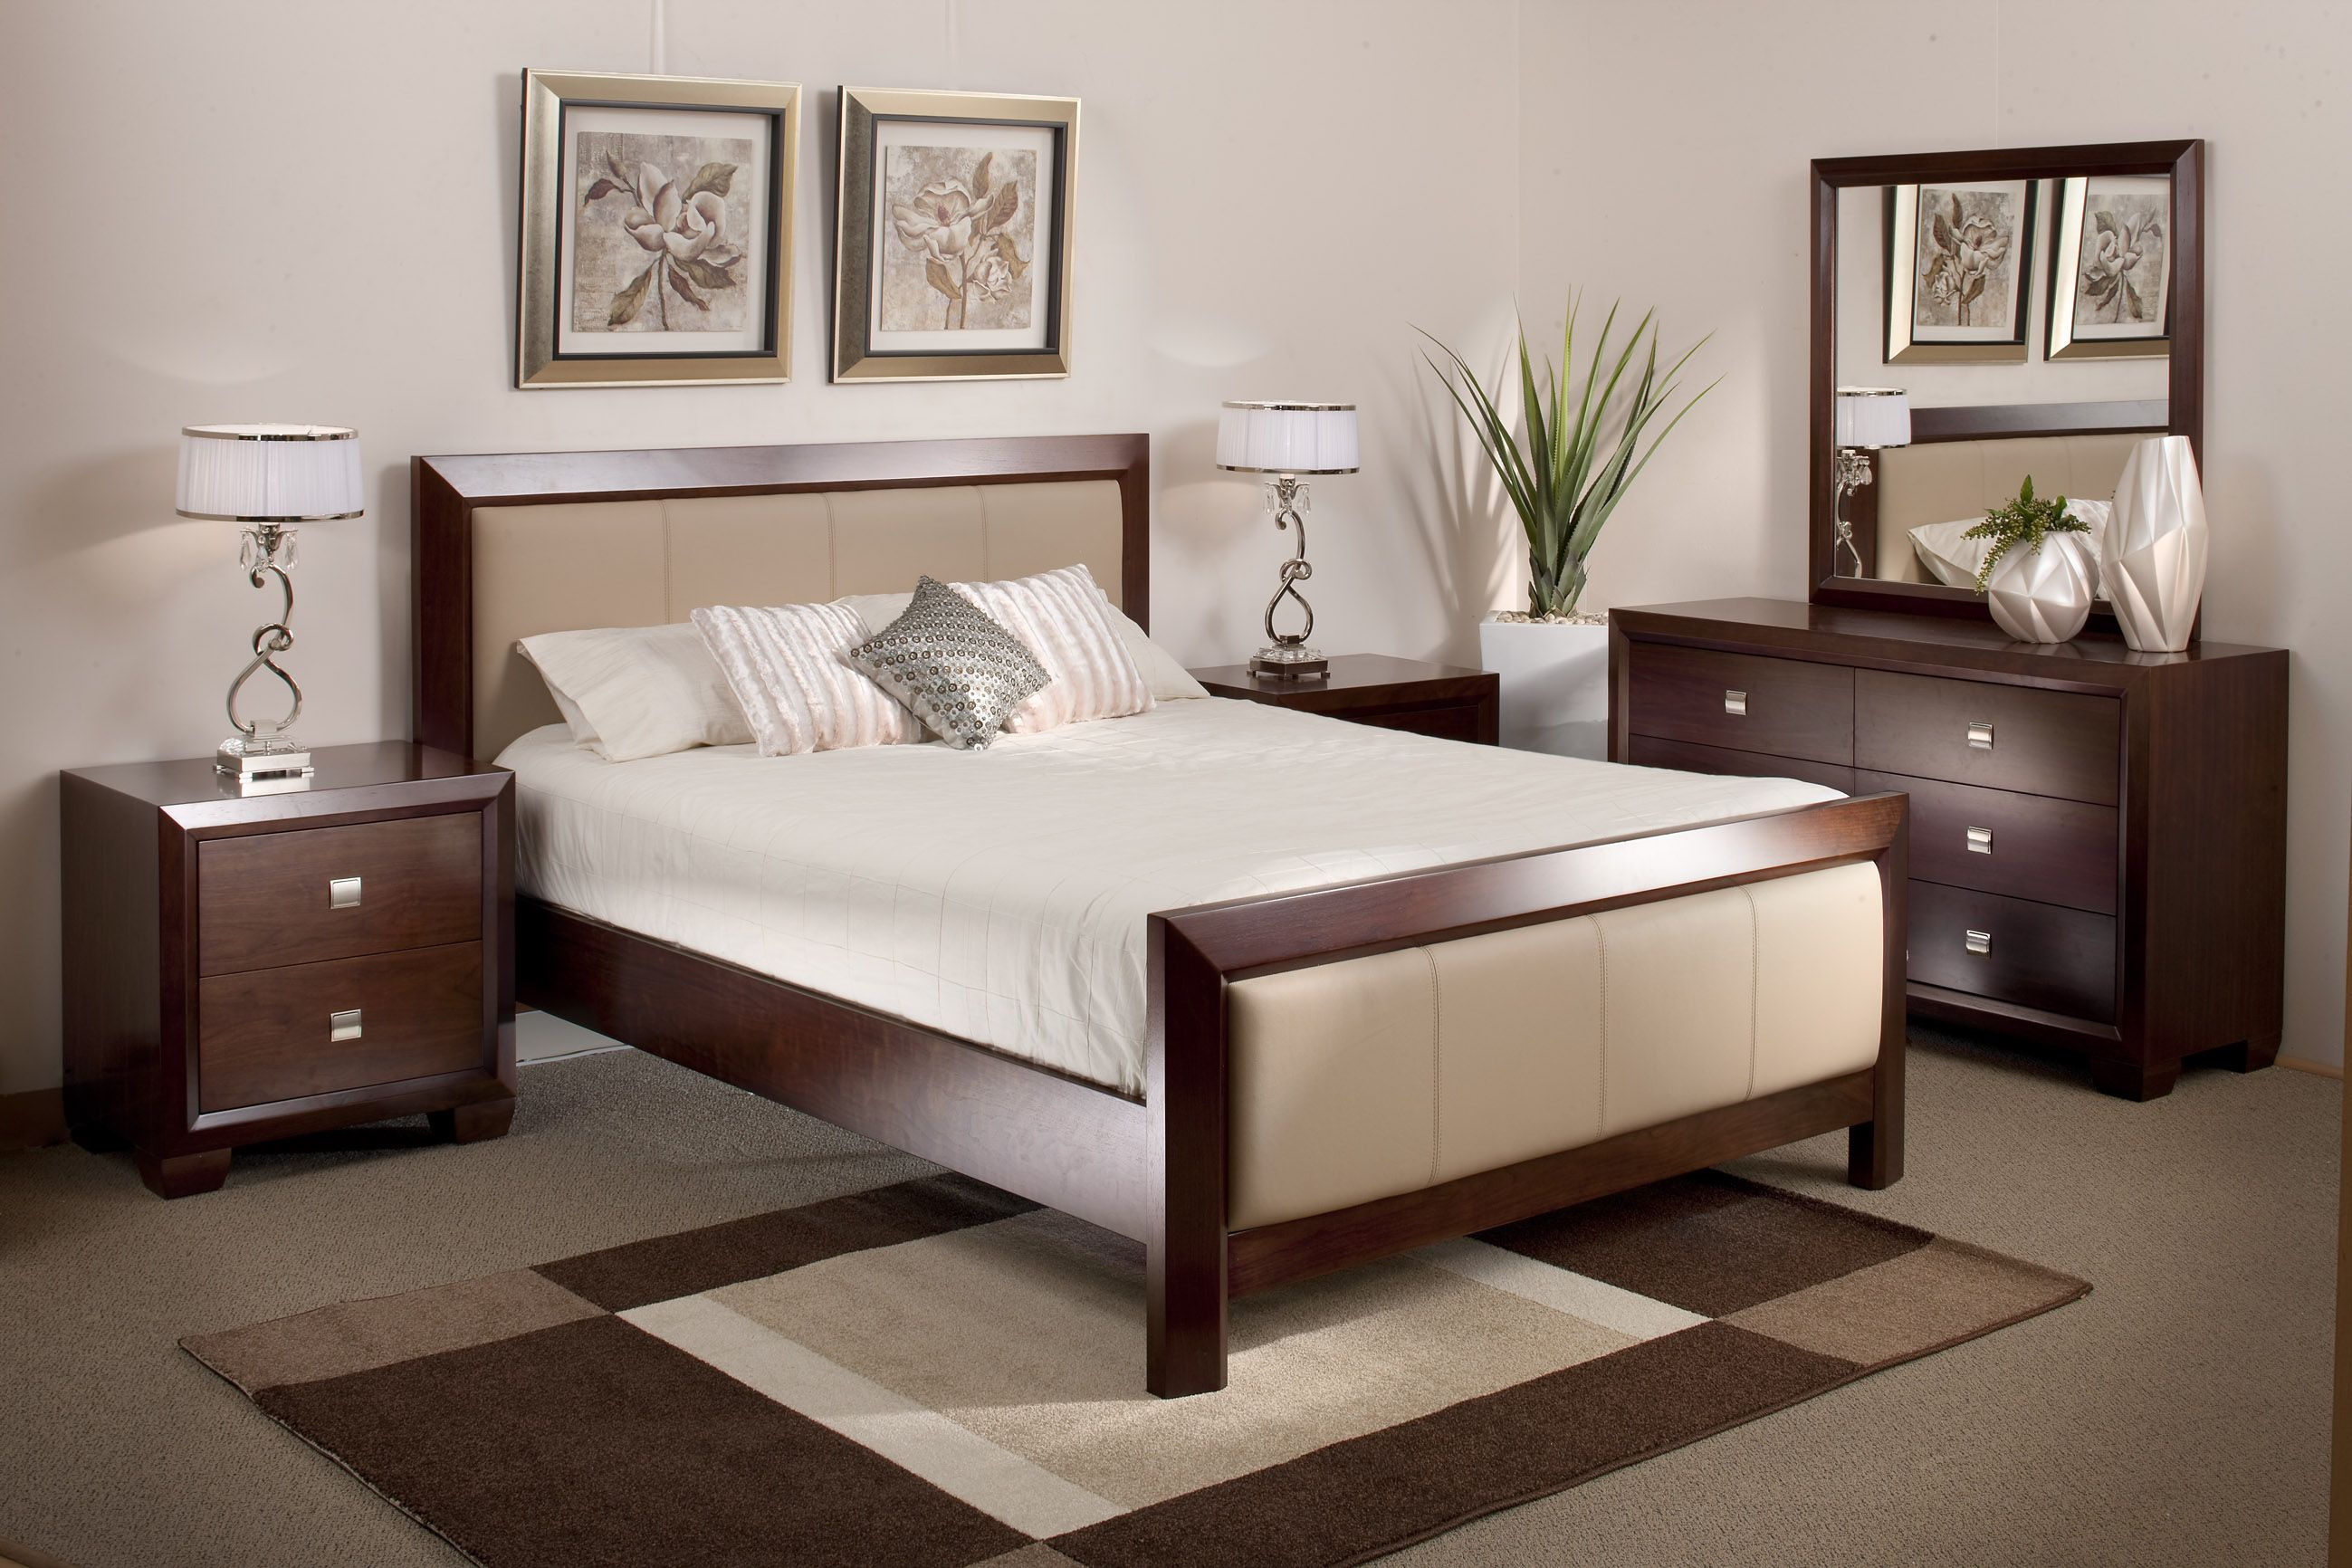 Where To Buy Bedroom Furniture All Information About Home Buy Bedroom Furniture Bedroom Furniture Sets Bedroom Sets